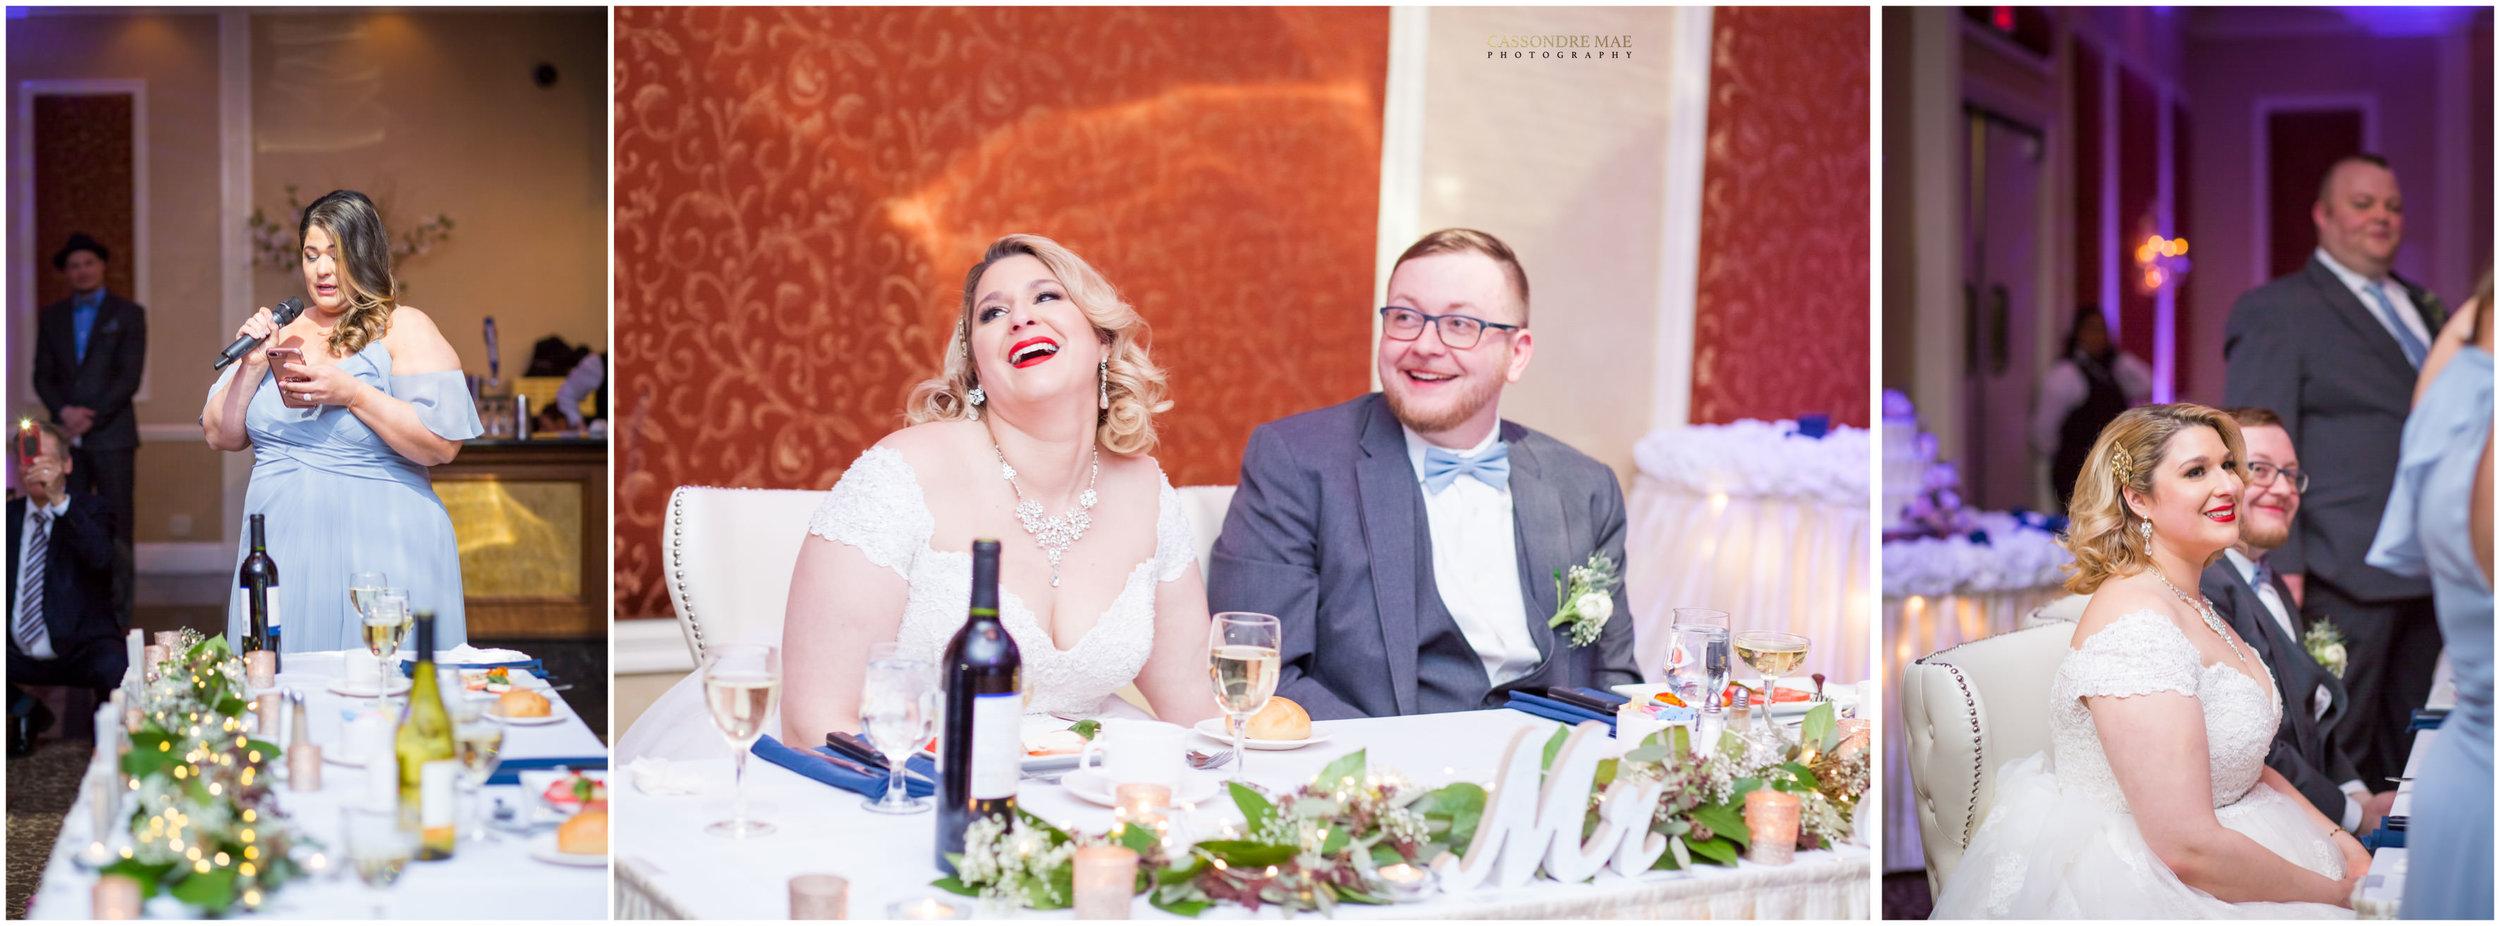 Cassondre Mae Photography Poughkeepsie NY Wedding 30.jpg